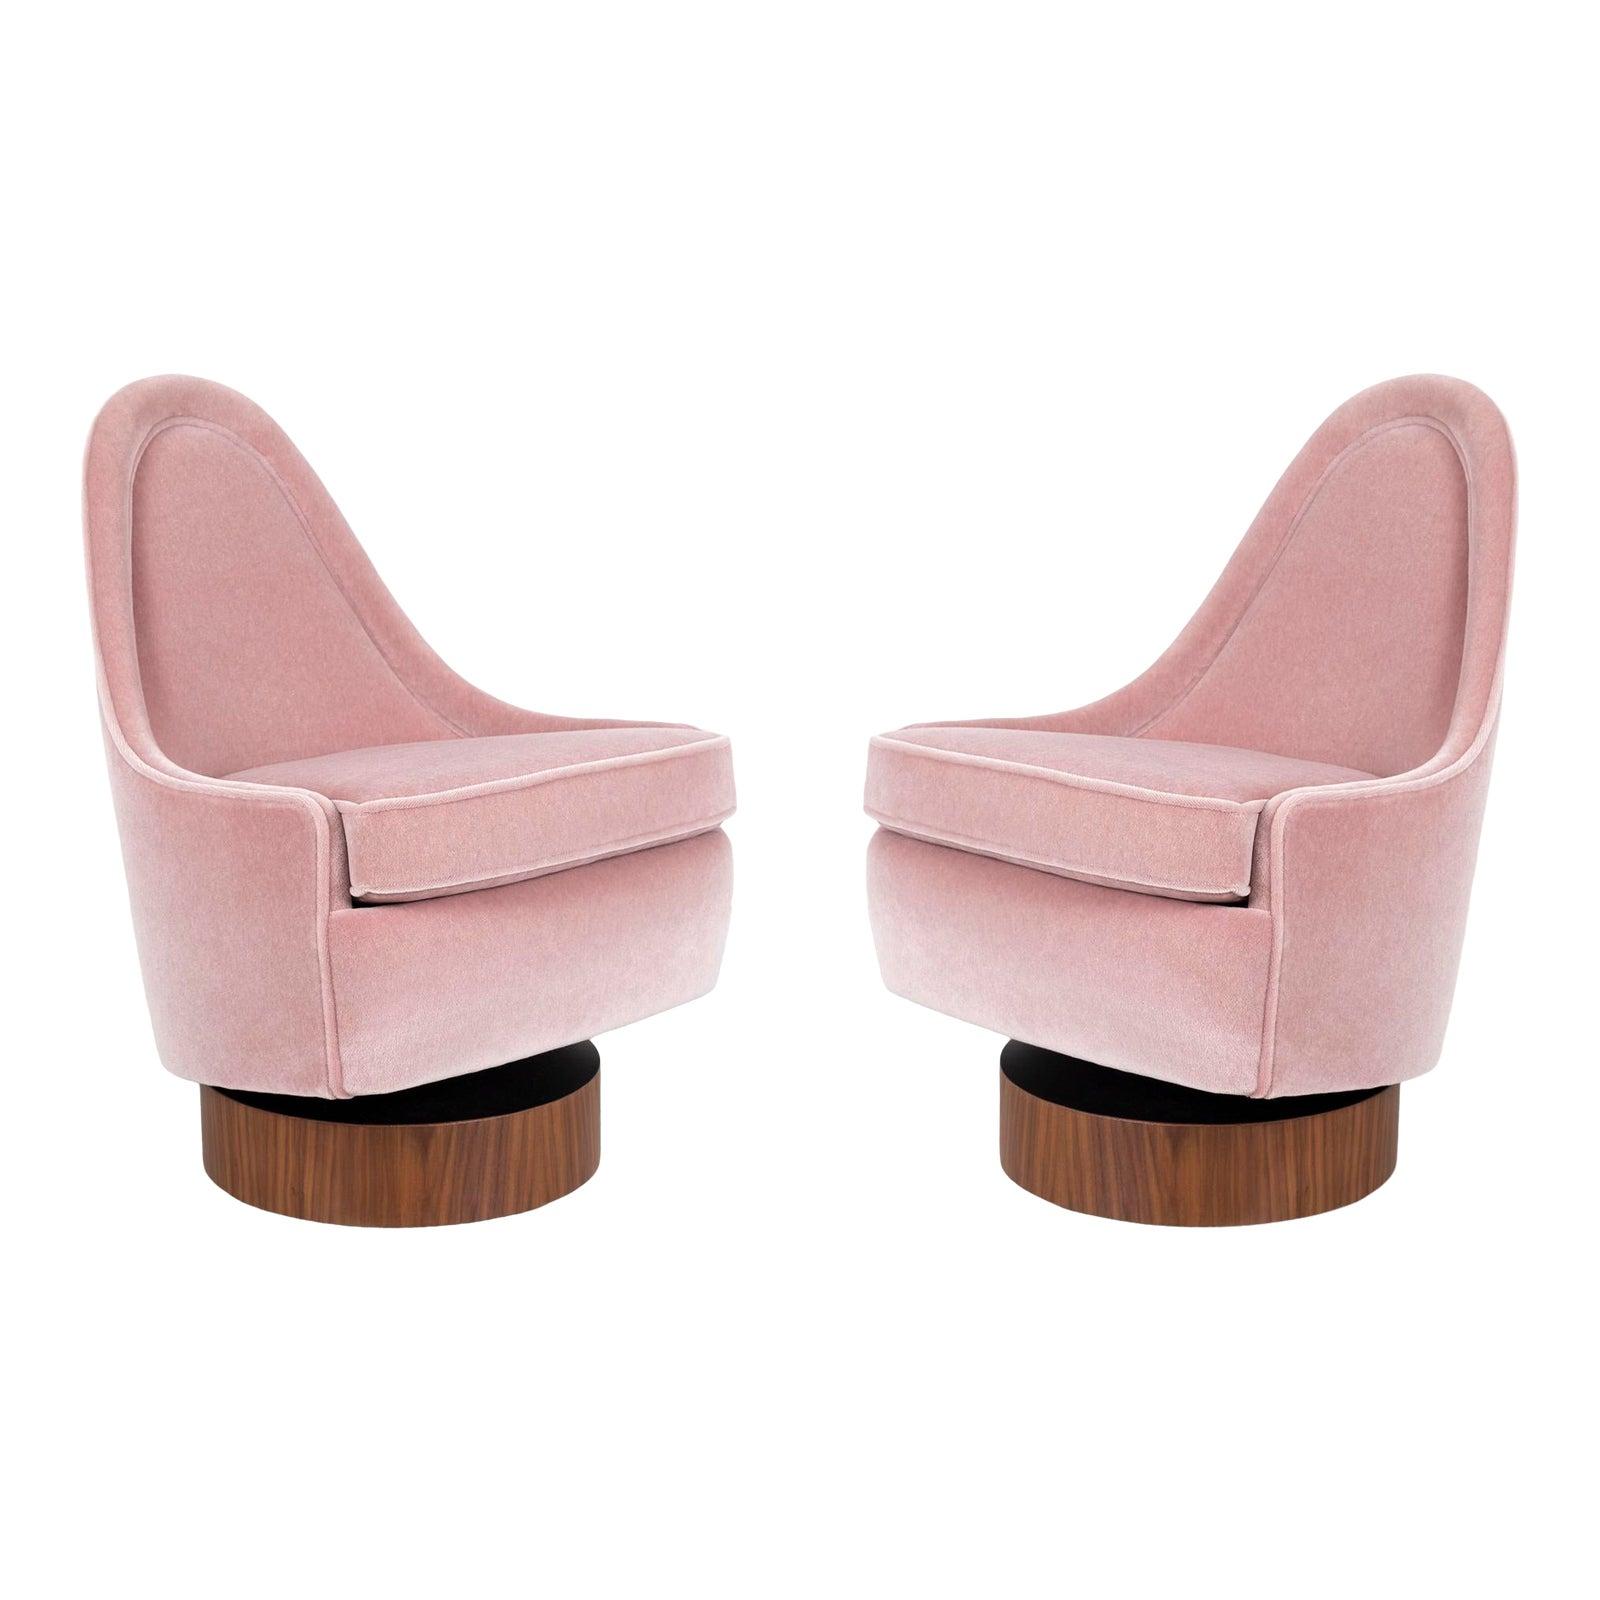 Milo Baughman Child's Size Swivel Chairs | Chairish